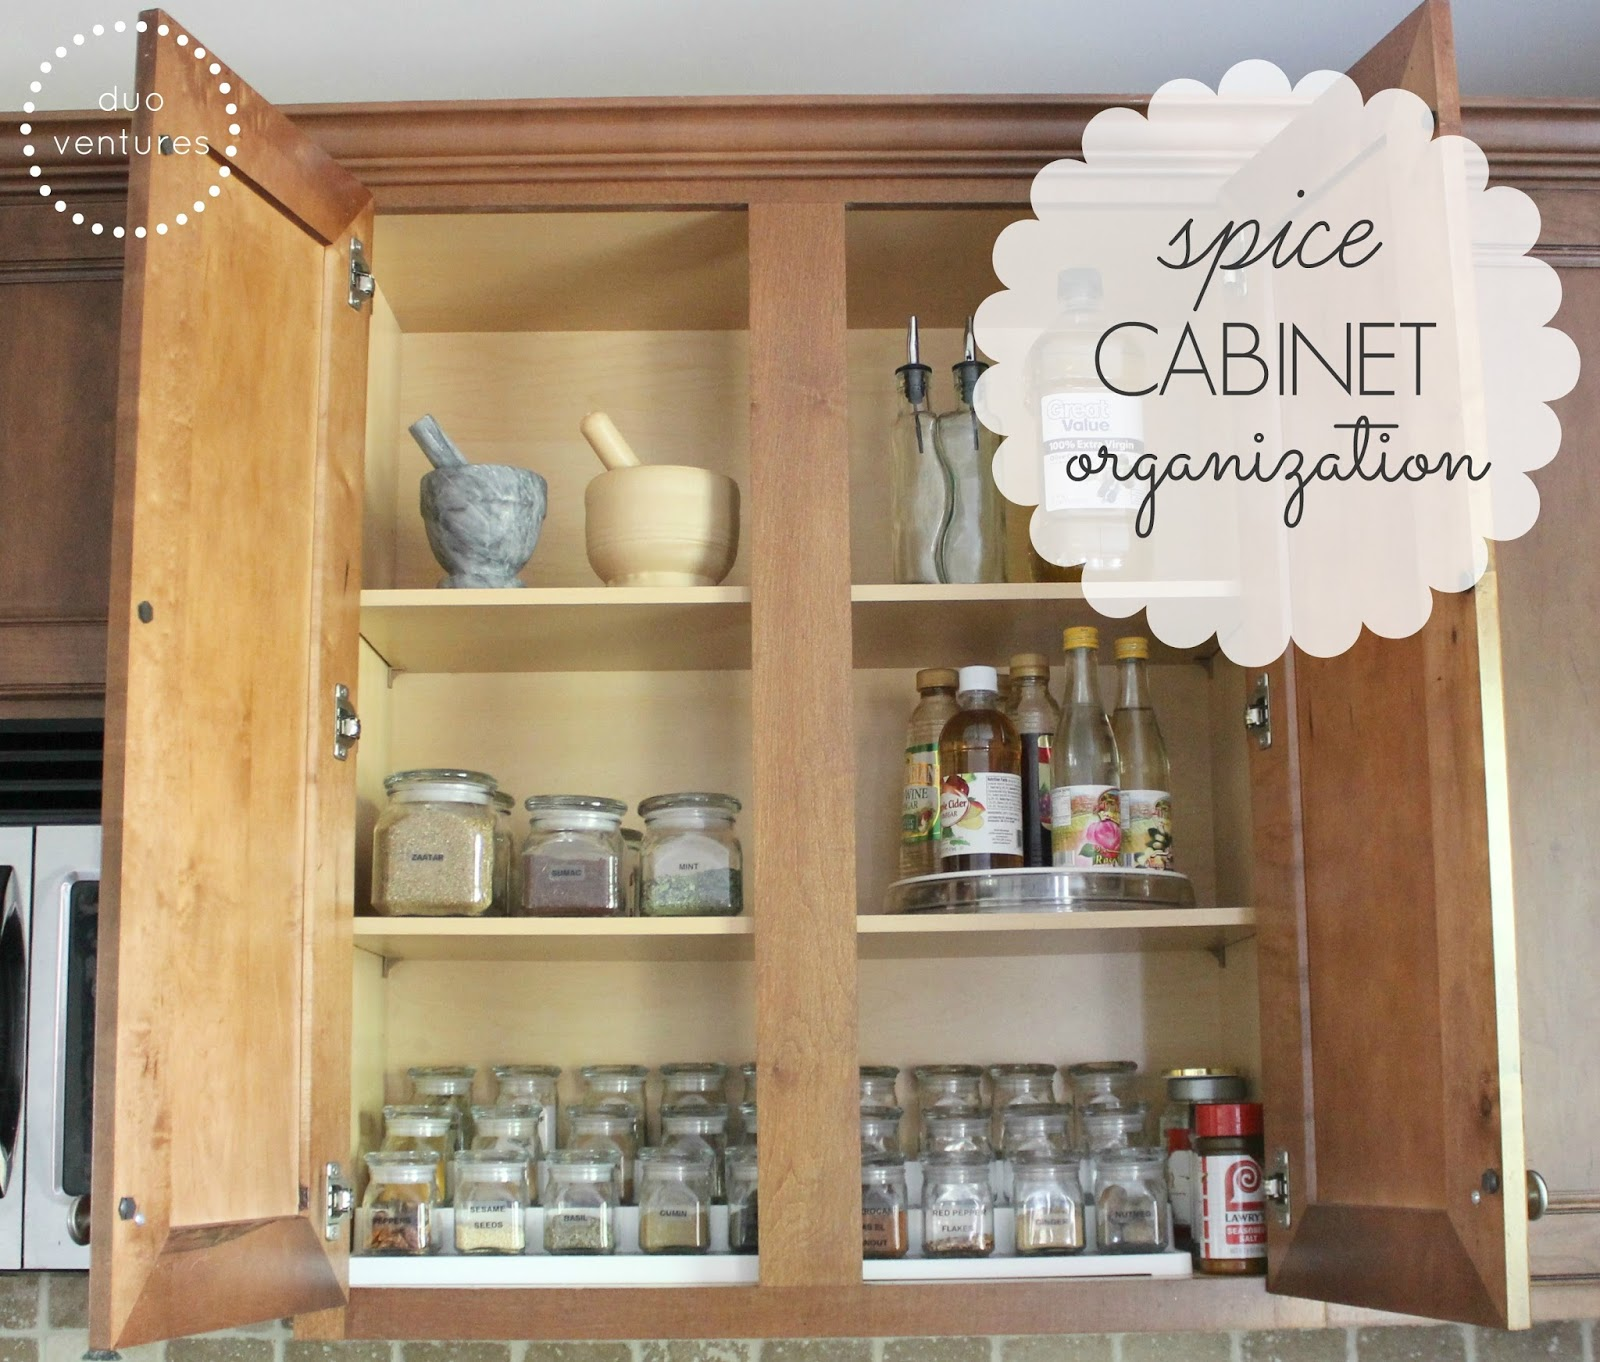 Spice CabiOrganization